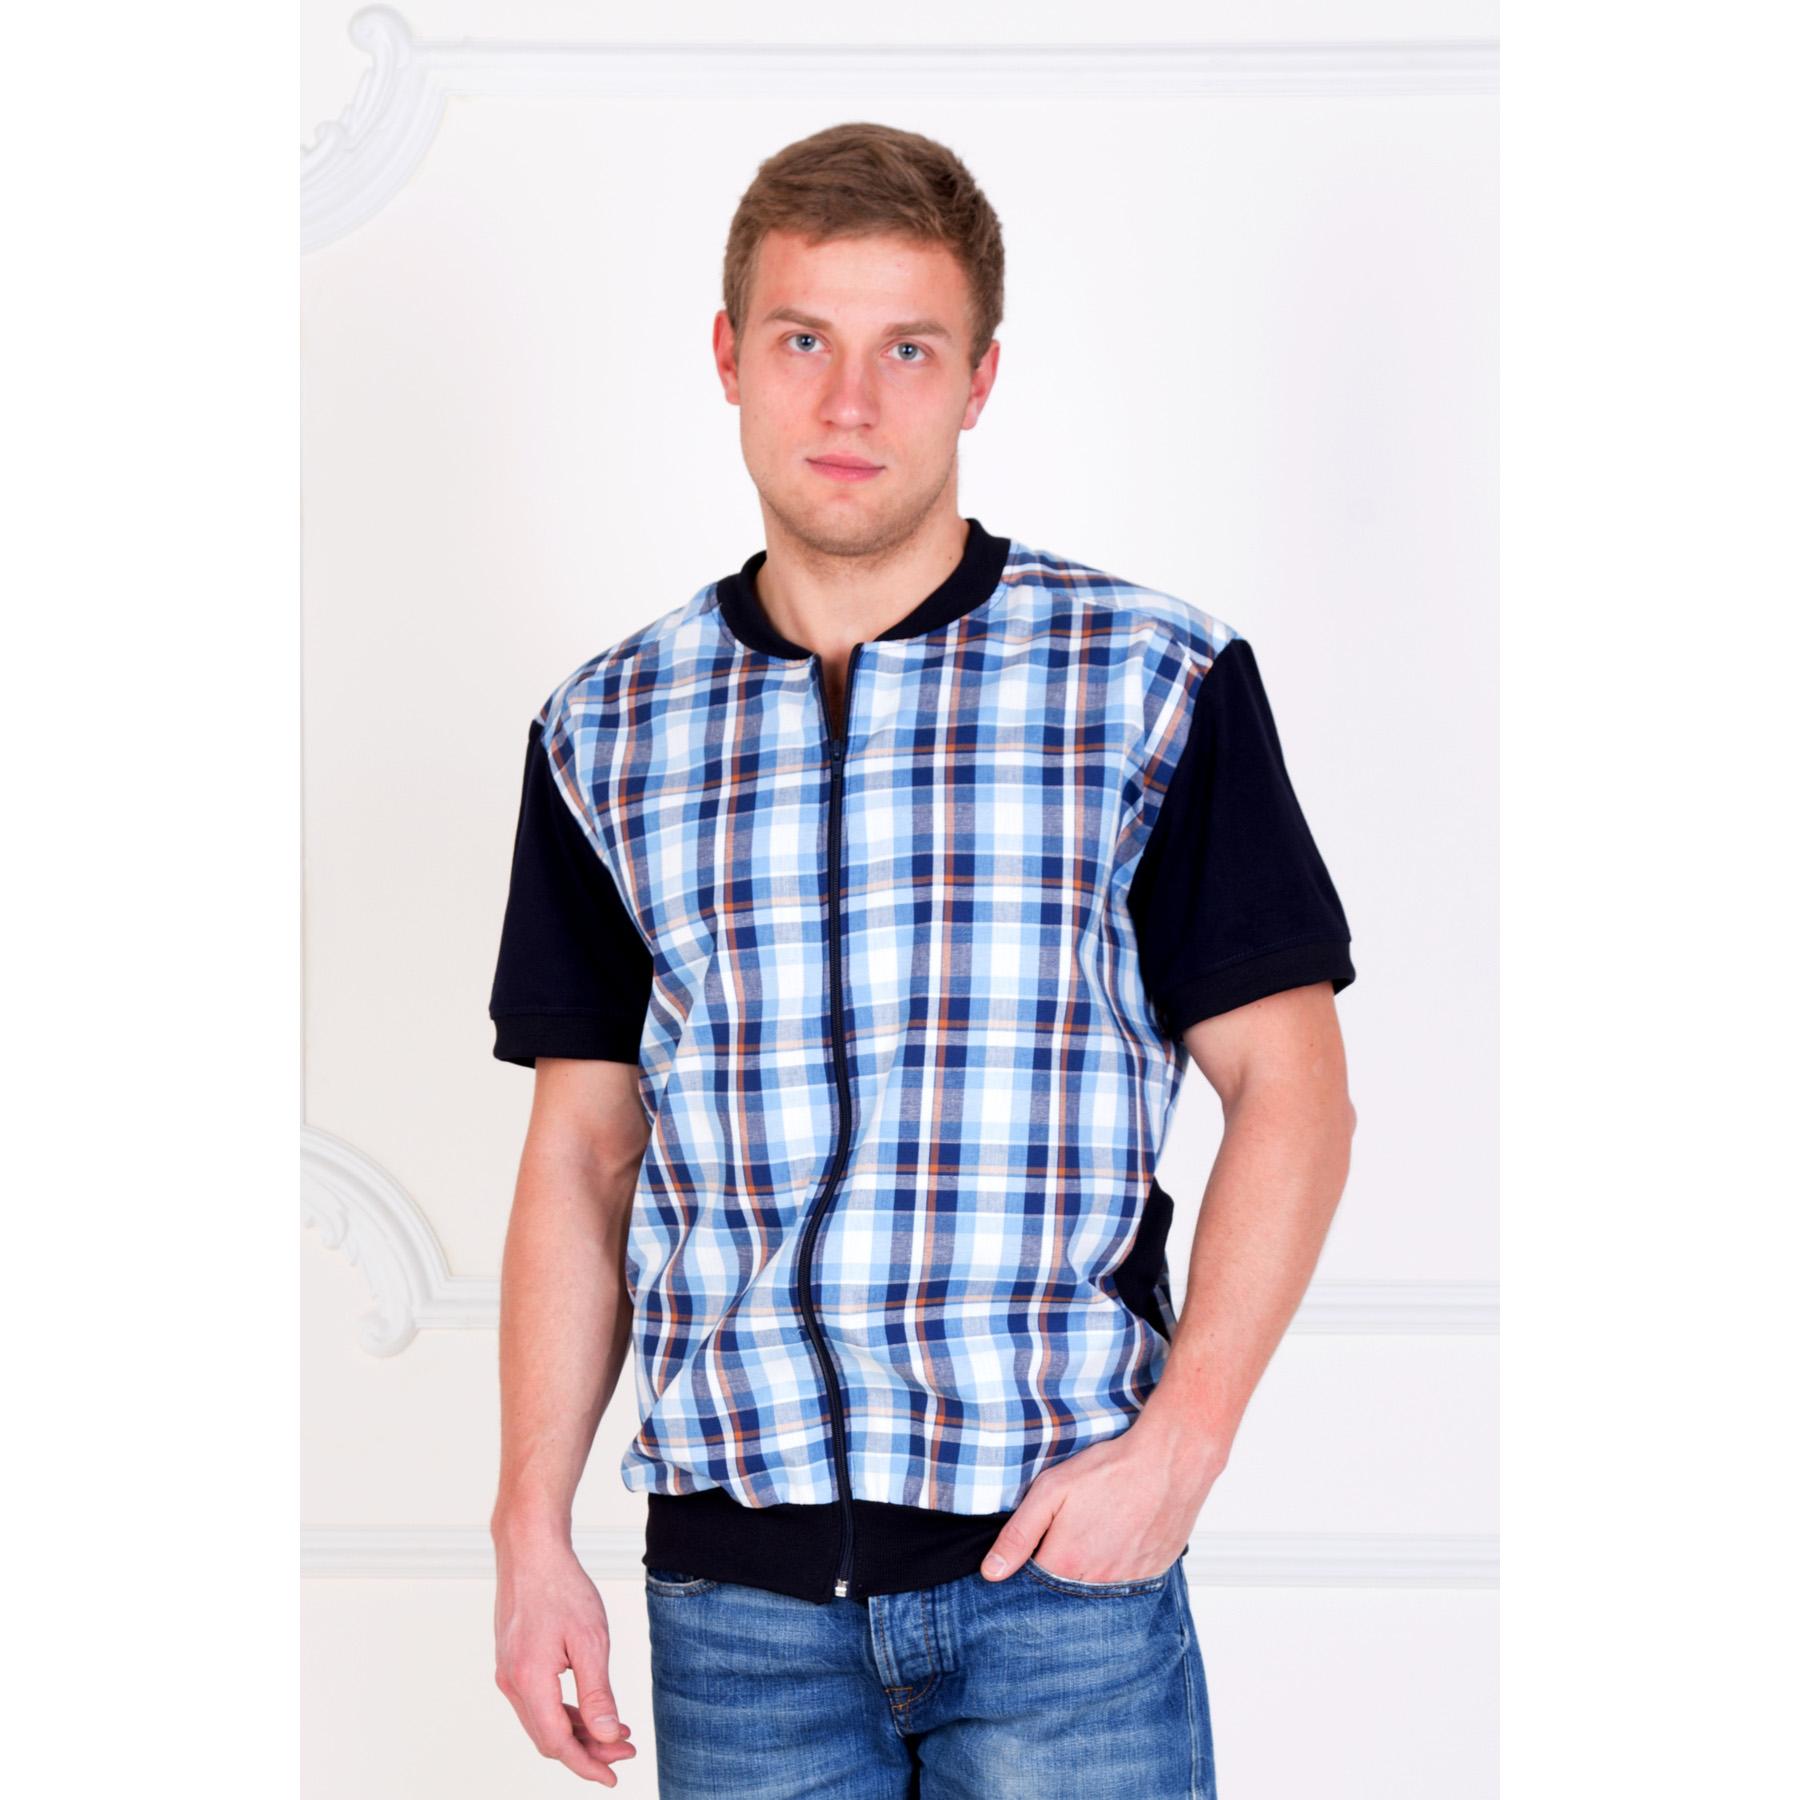 Мужская рубашка Аполлон арт. 0029, размер 48Толстовки, джемпера и рубашки<br>Обхват груди:96 см<br>Обхват талии:88 см<br>Обхват бедер:102 см<br>Рост:172-180 см<br><br>Тип: Муж. рубашка<br>Размер: 48<br>Материал: Шотландка